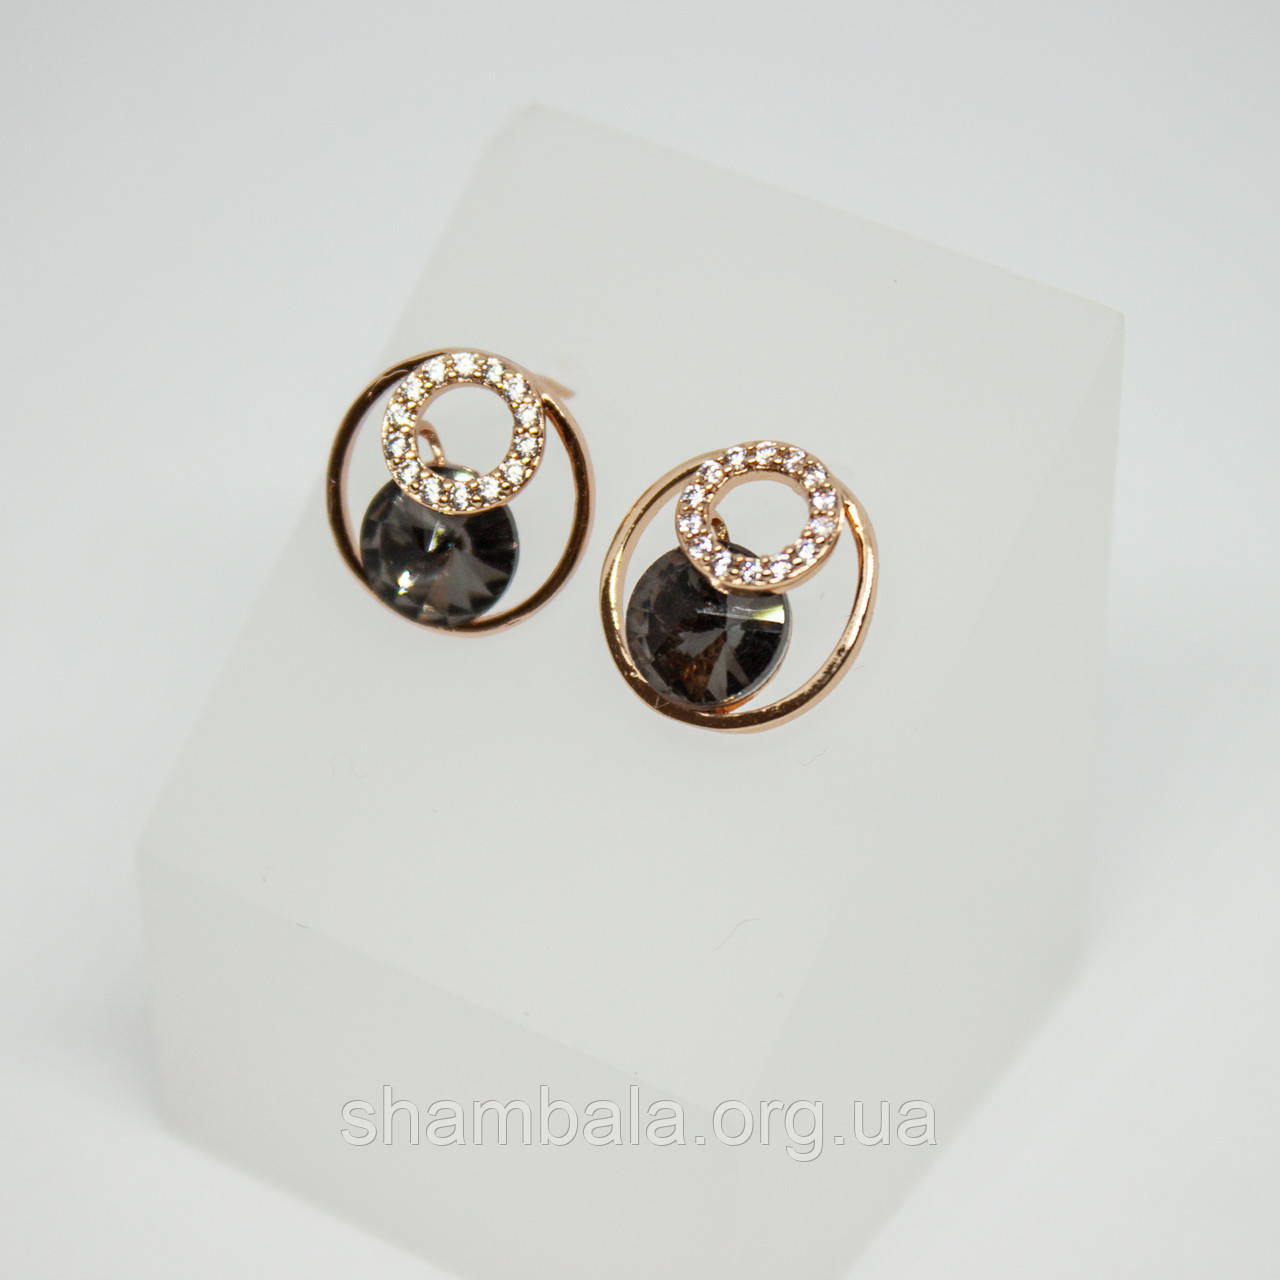 "Серьги Xuping Jewelry ""Инь янь"" позолота (74689)"